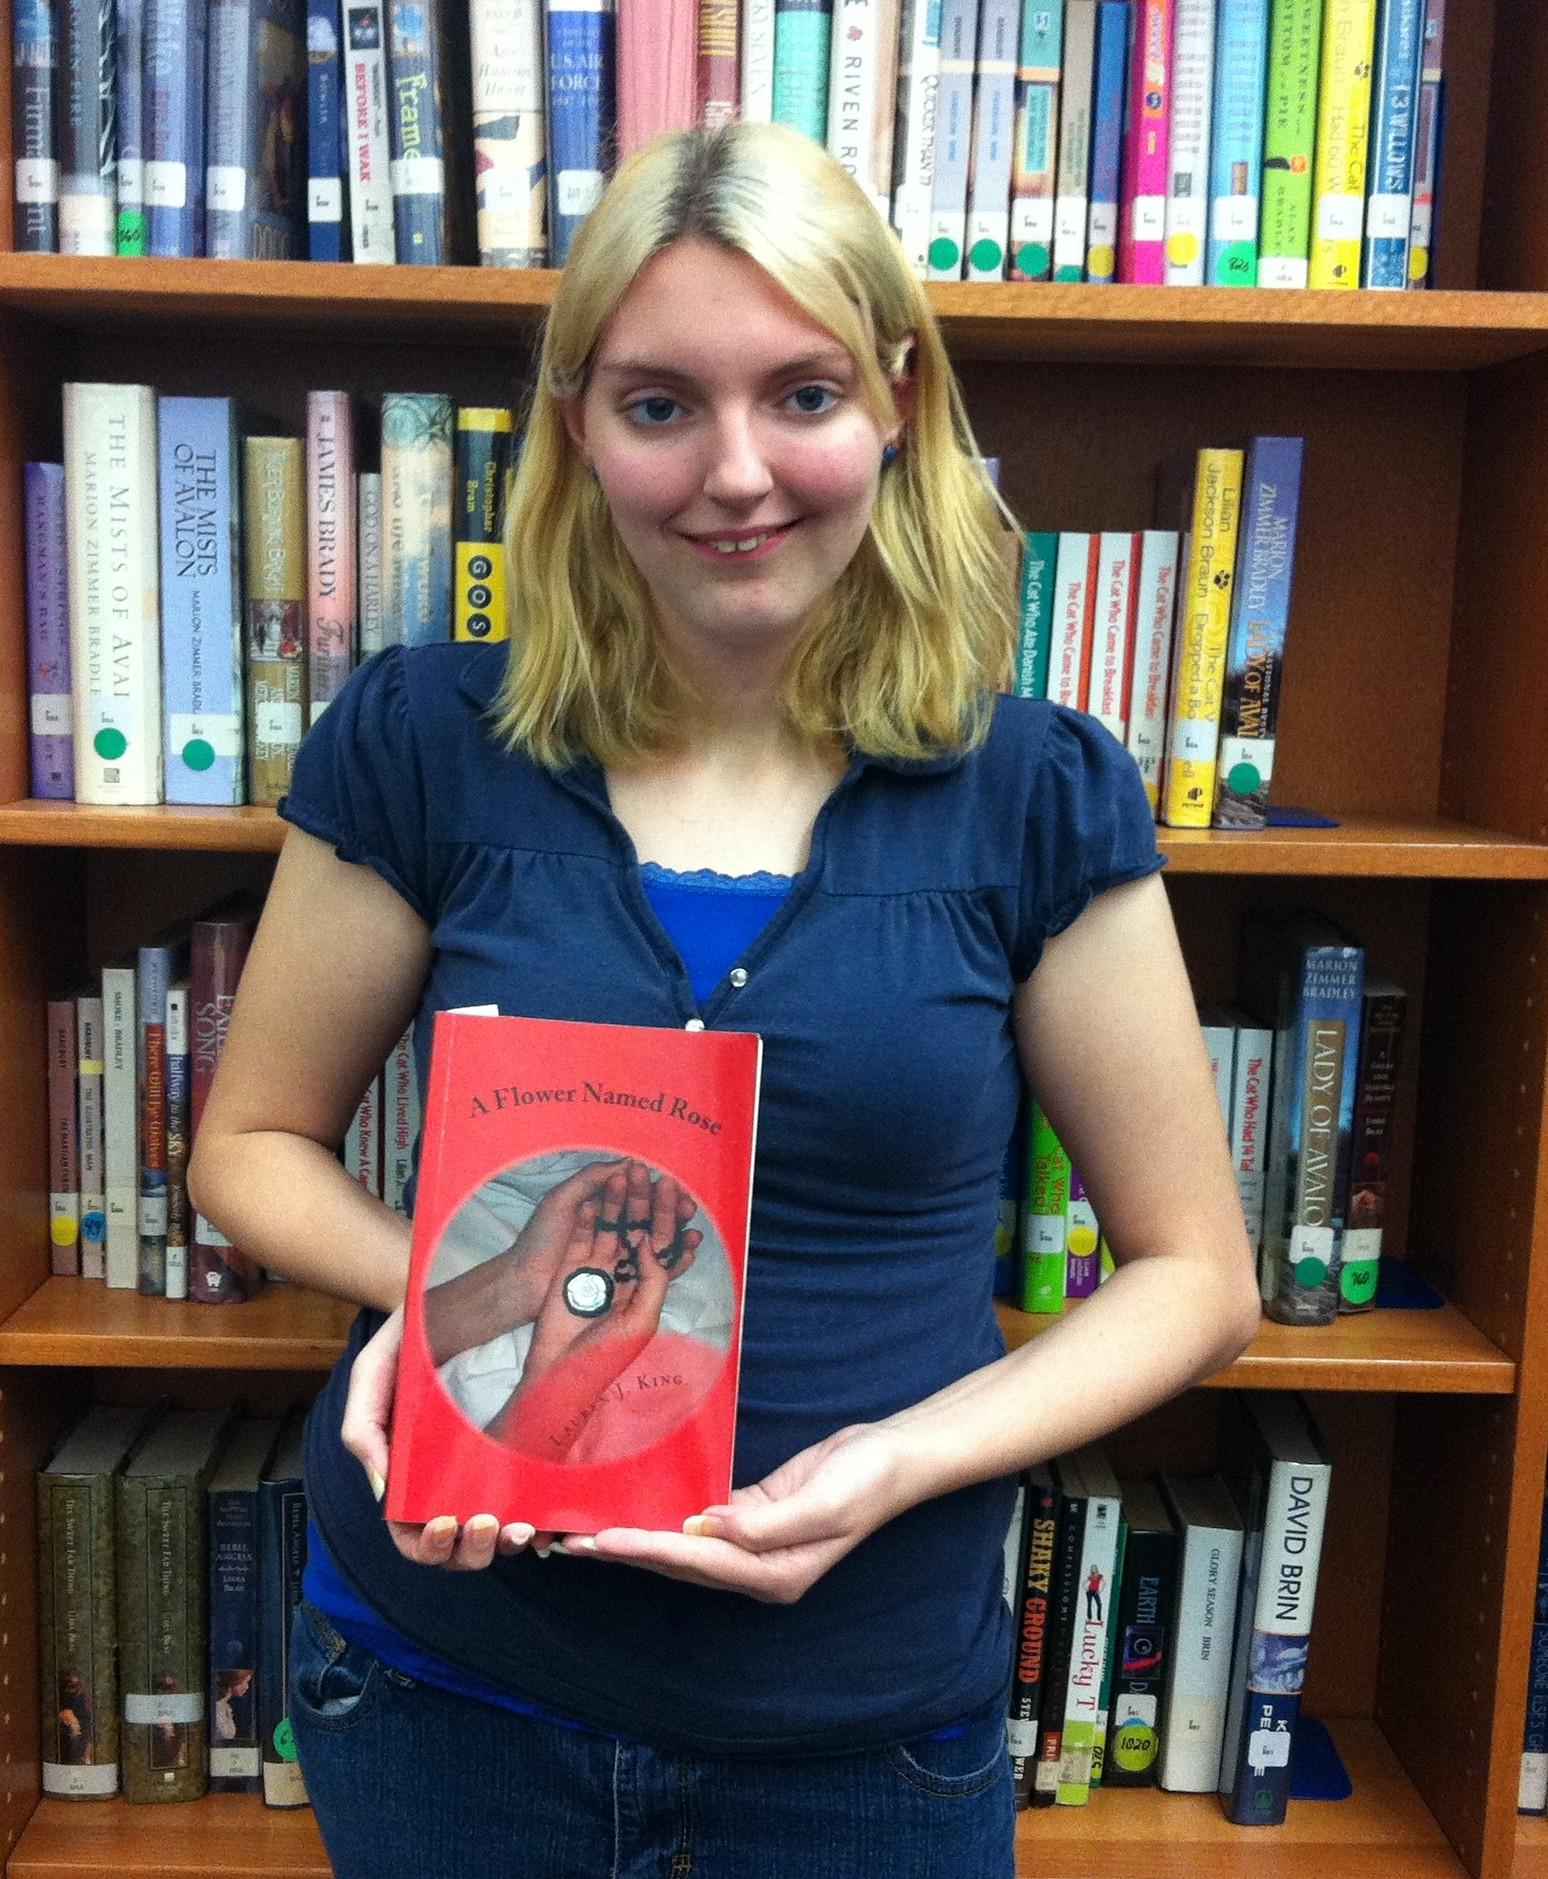 Centennial junior publishes novel